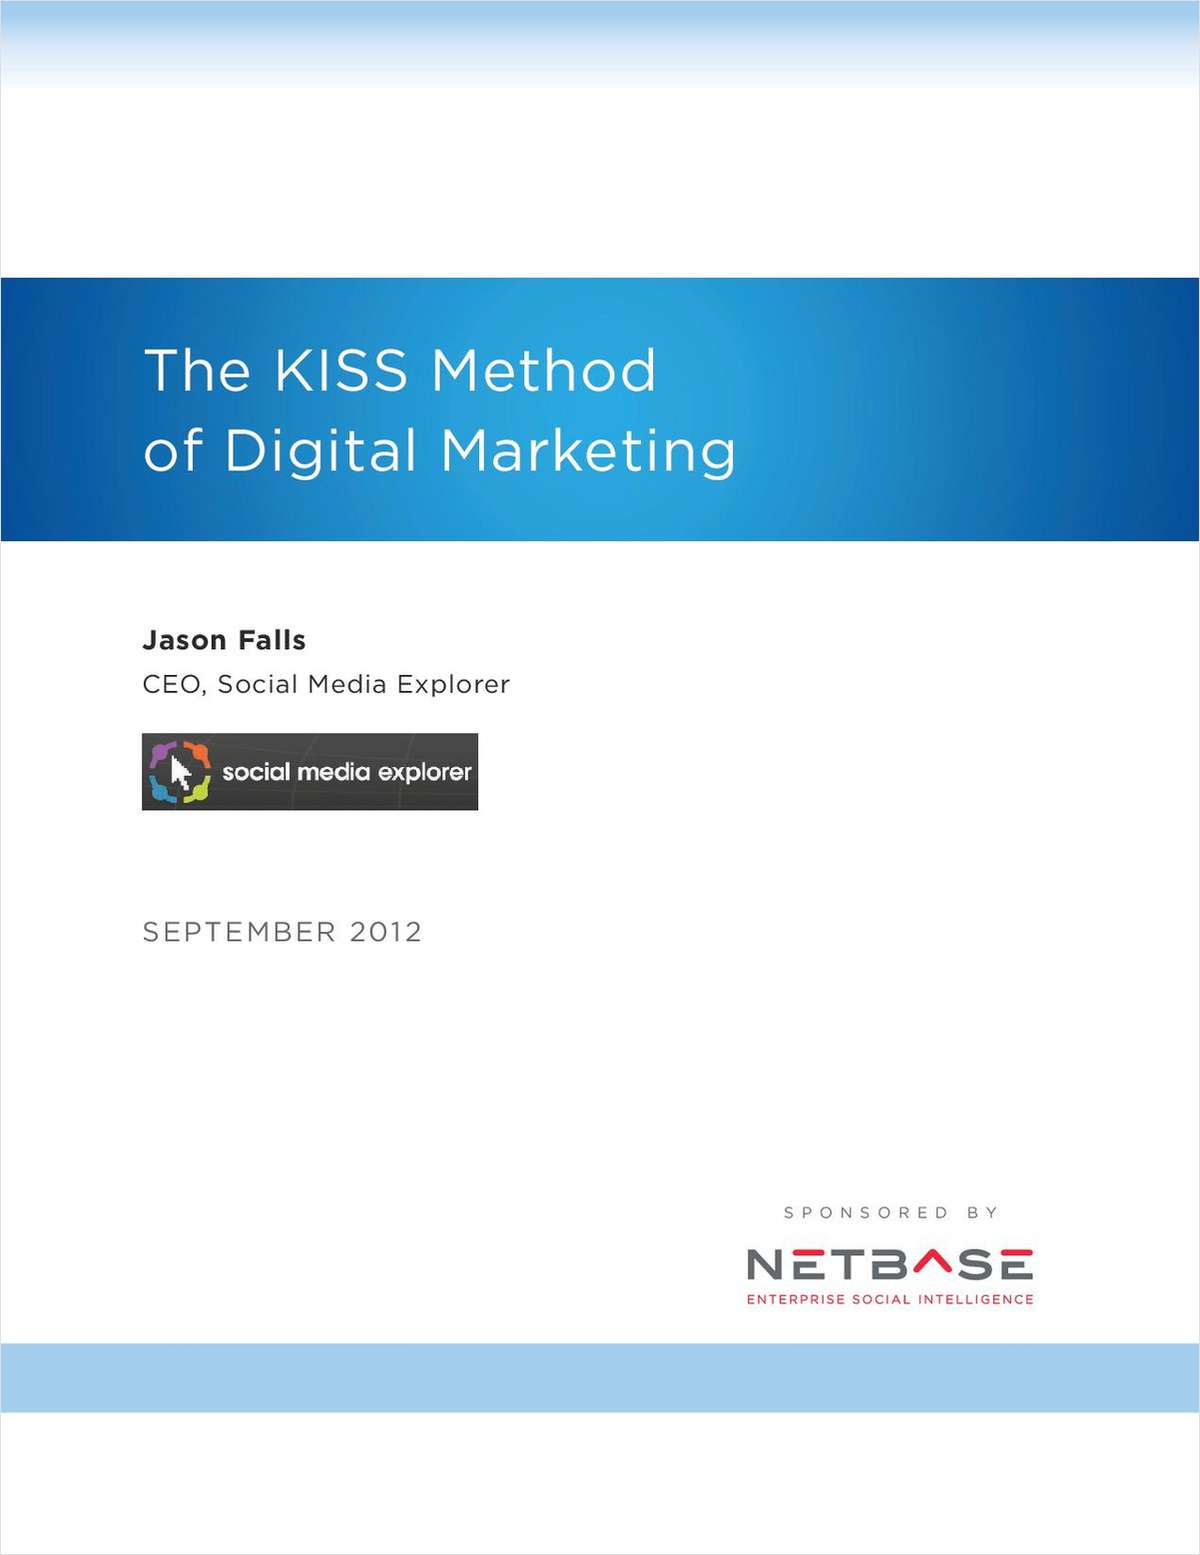 The KISS Method of Digital Marketing Success